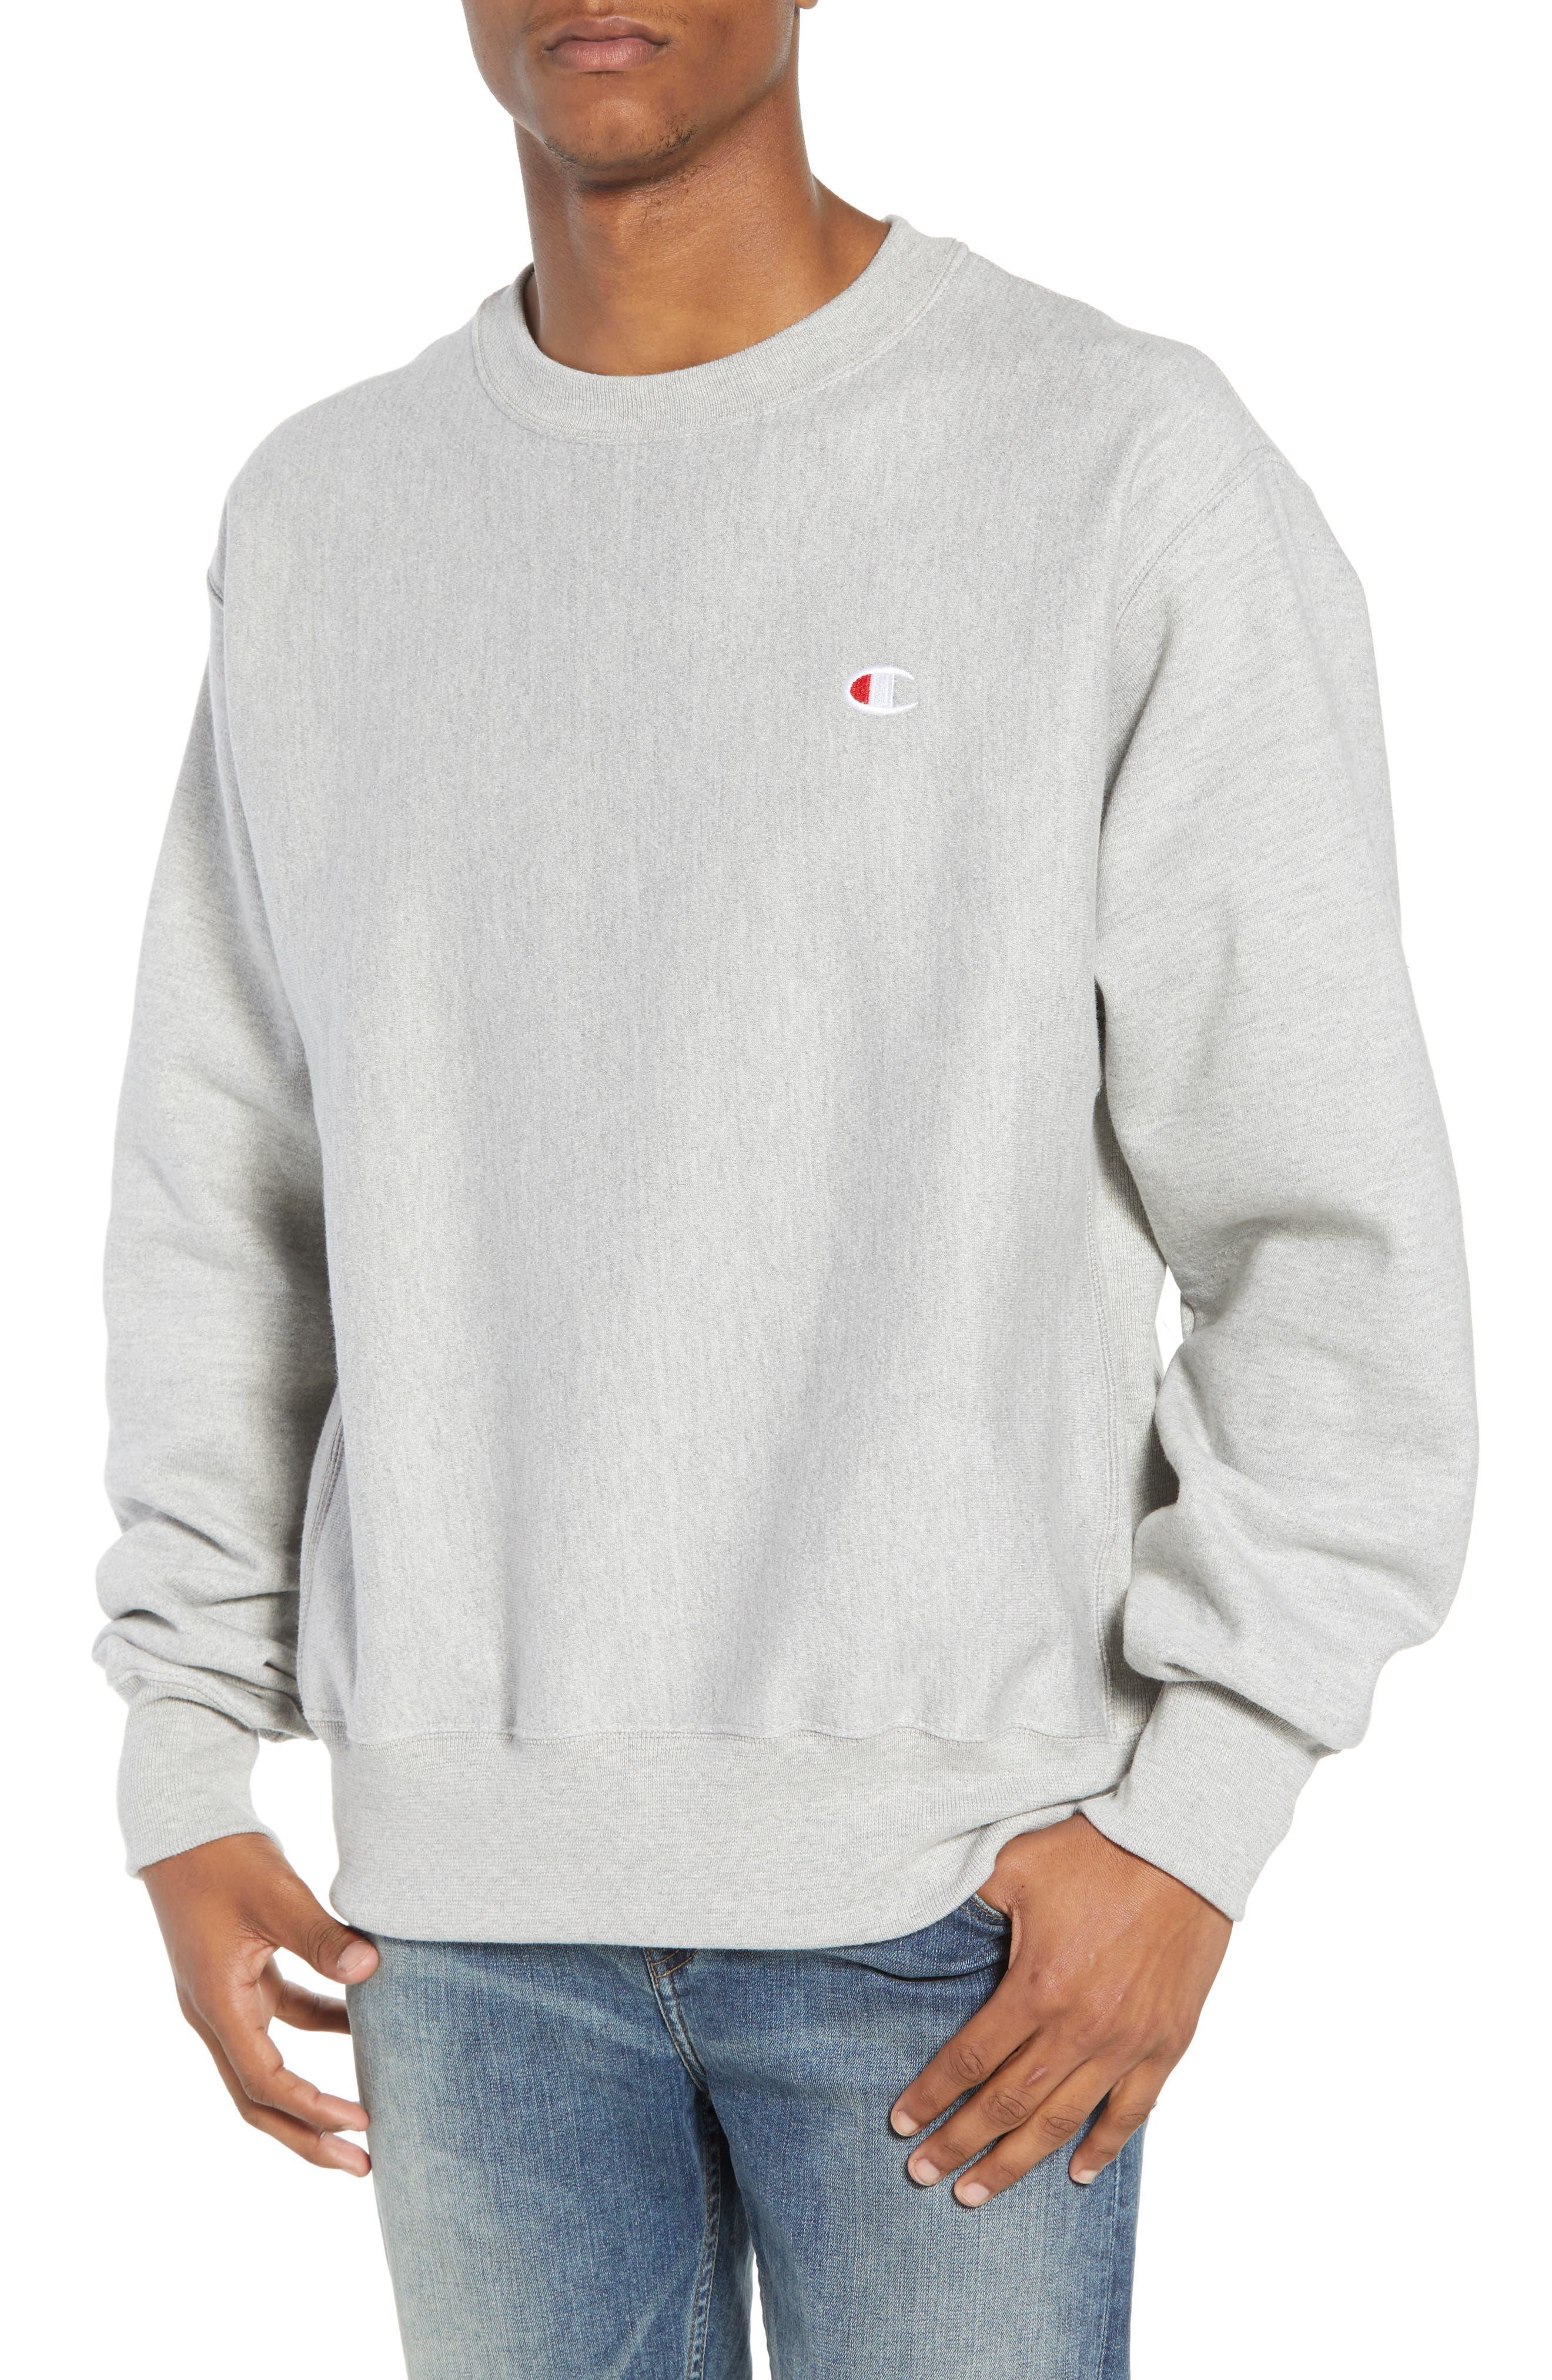 CHAMPION Reverse Weave Sweatshirt, Main, color, OXFORD GRAY